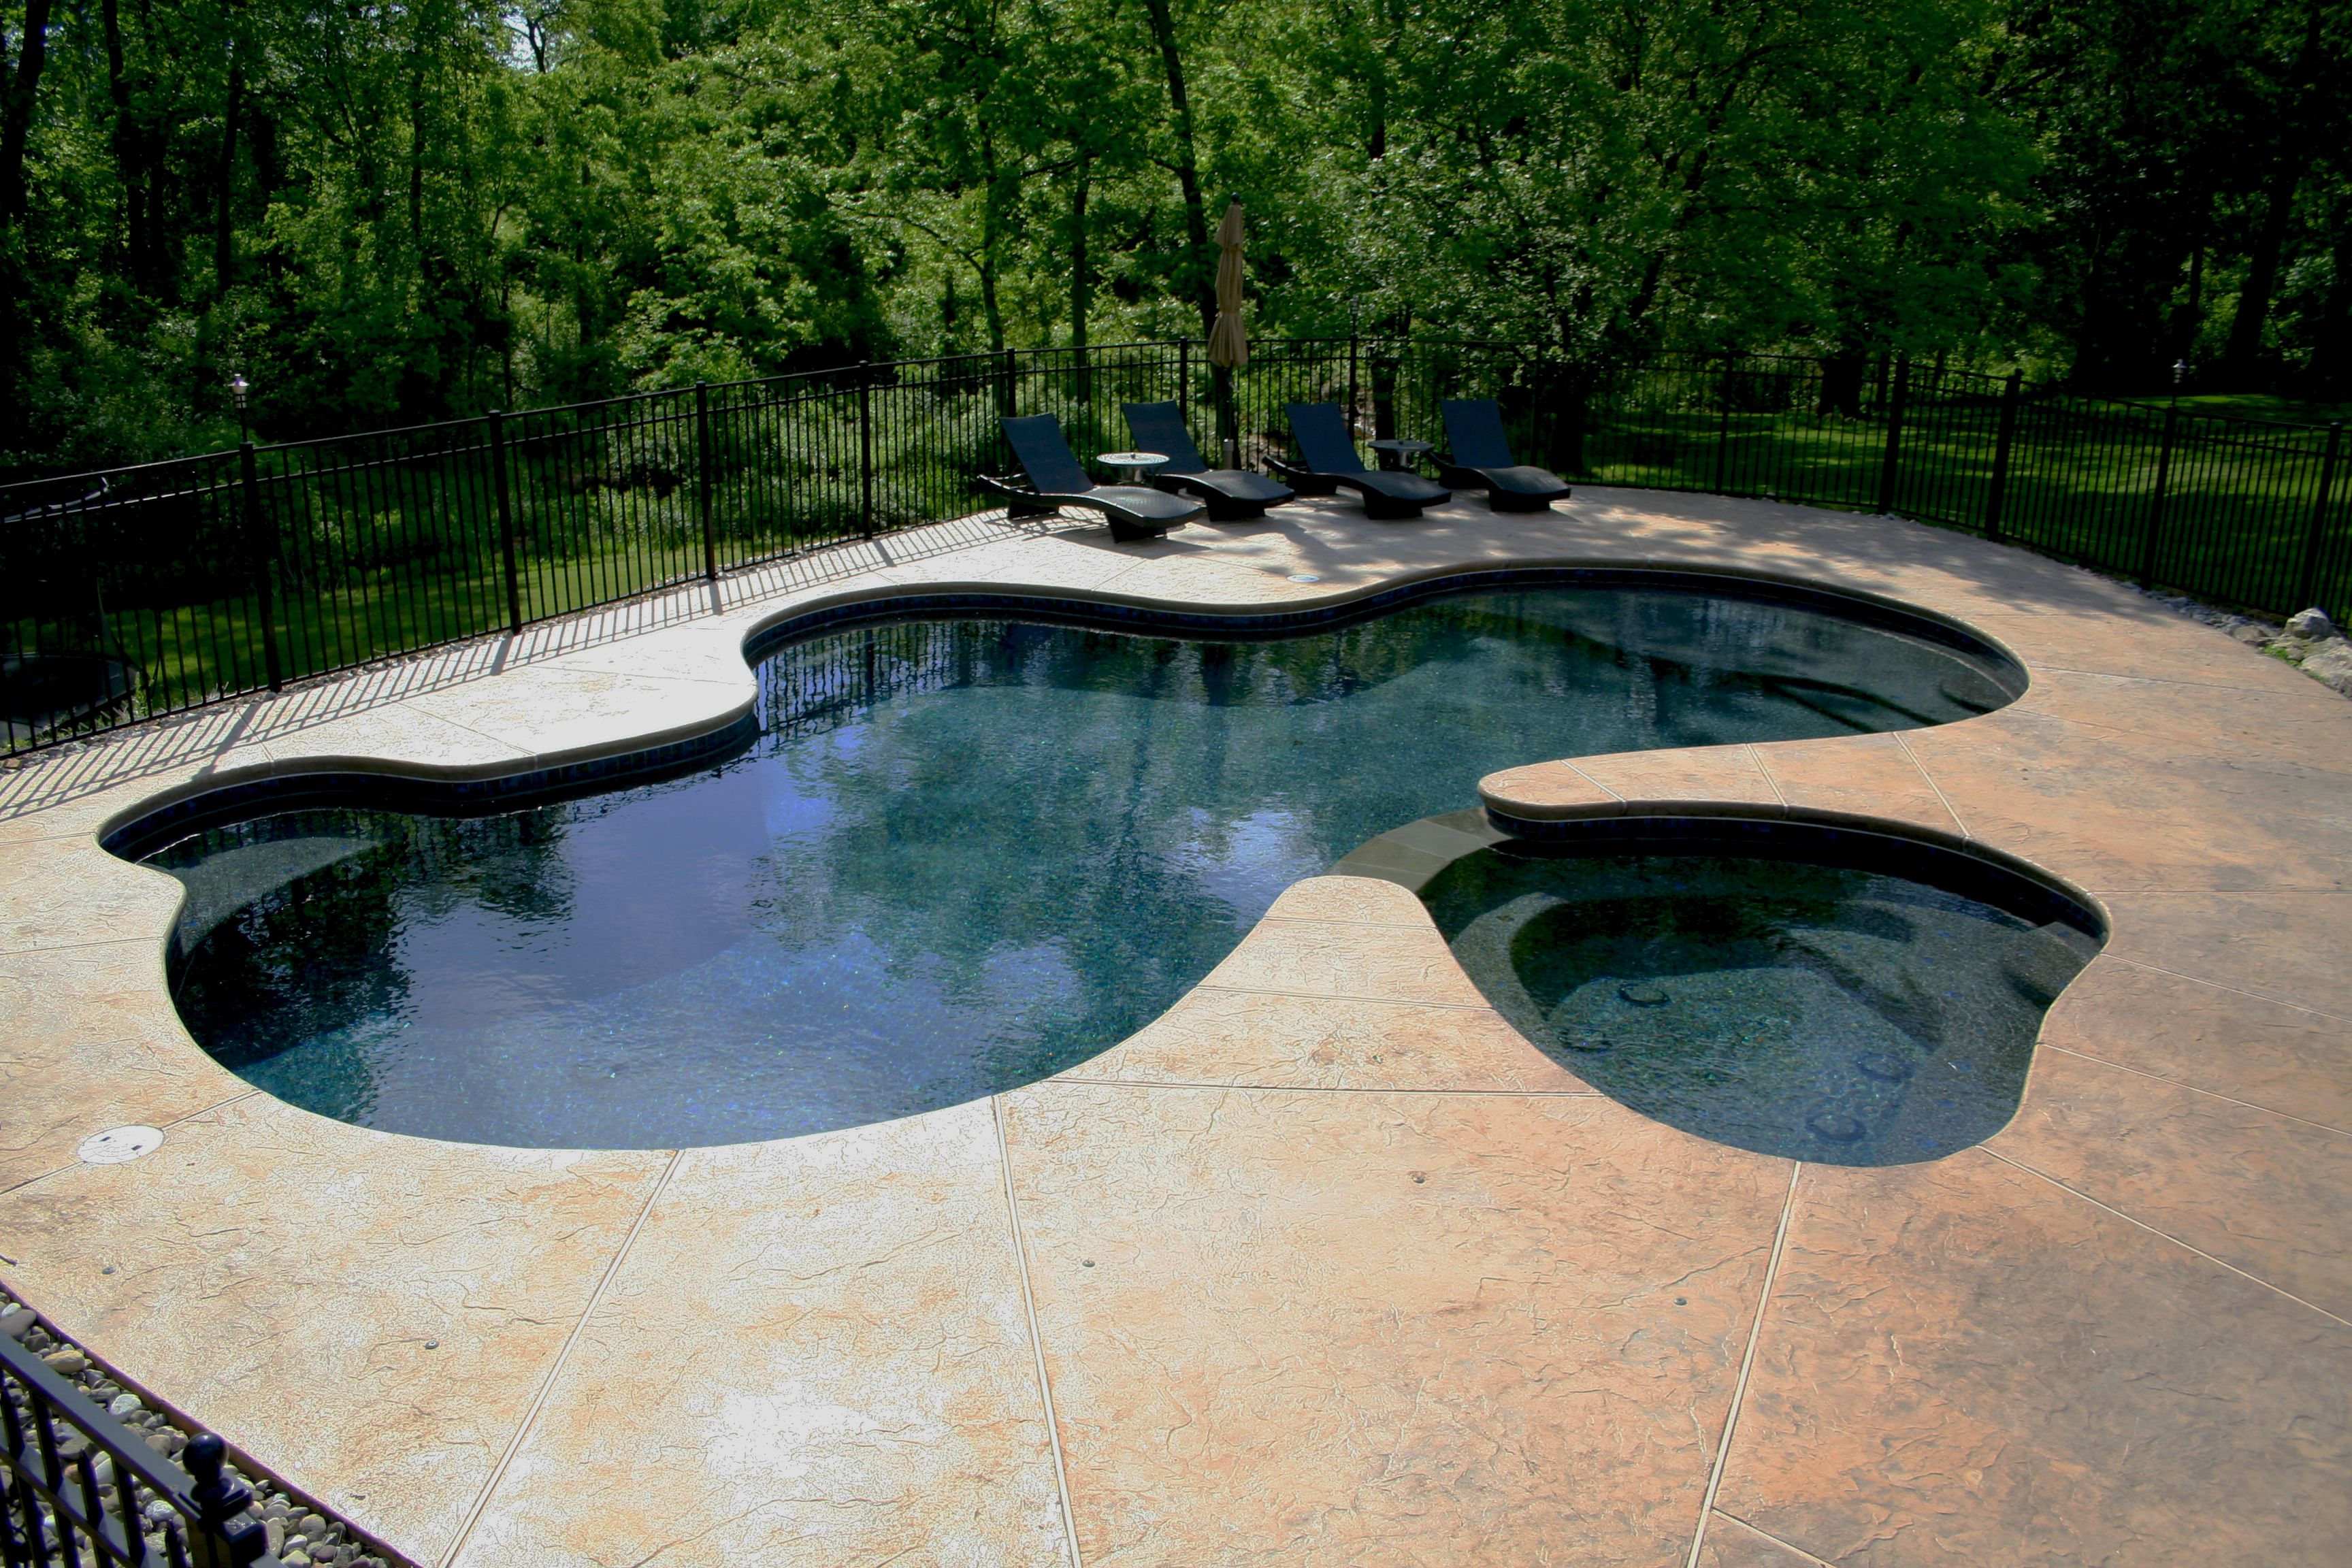 Swimming Pool Plastering Contractors : Free form in ground concrete gunite plaster pool spa combo